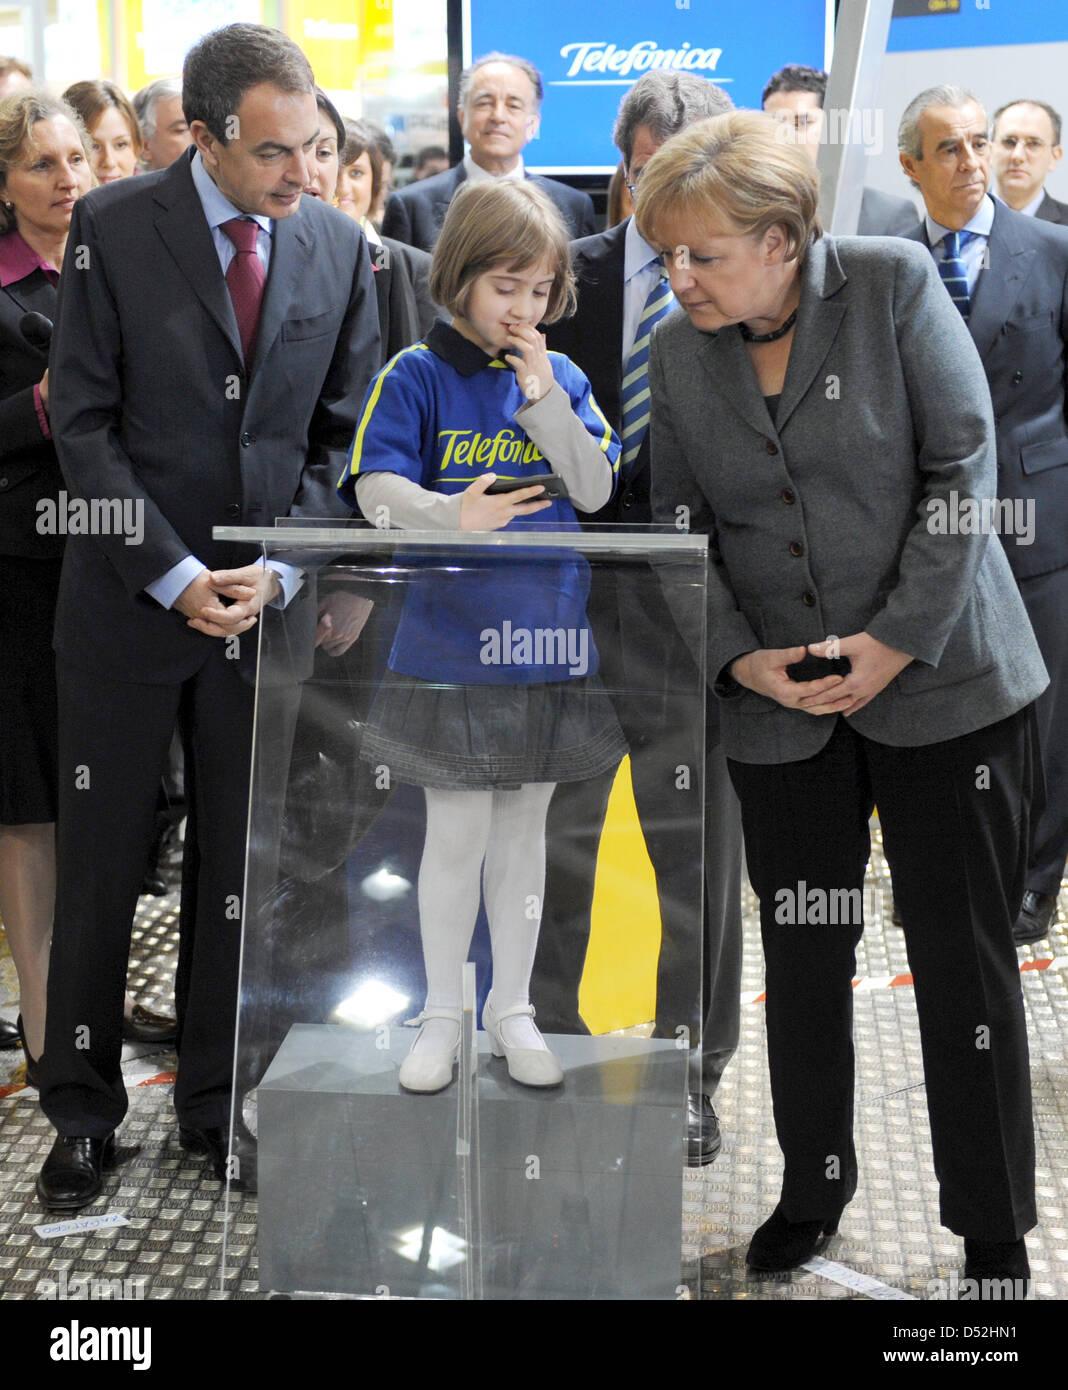 German Chancellor Angela Merkel (R) and Spanish Prime Minister Jose Luis Rodriguez Zapatero visit little Maria (C) - Stock Image